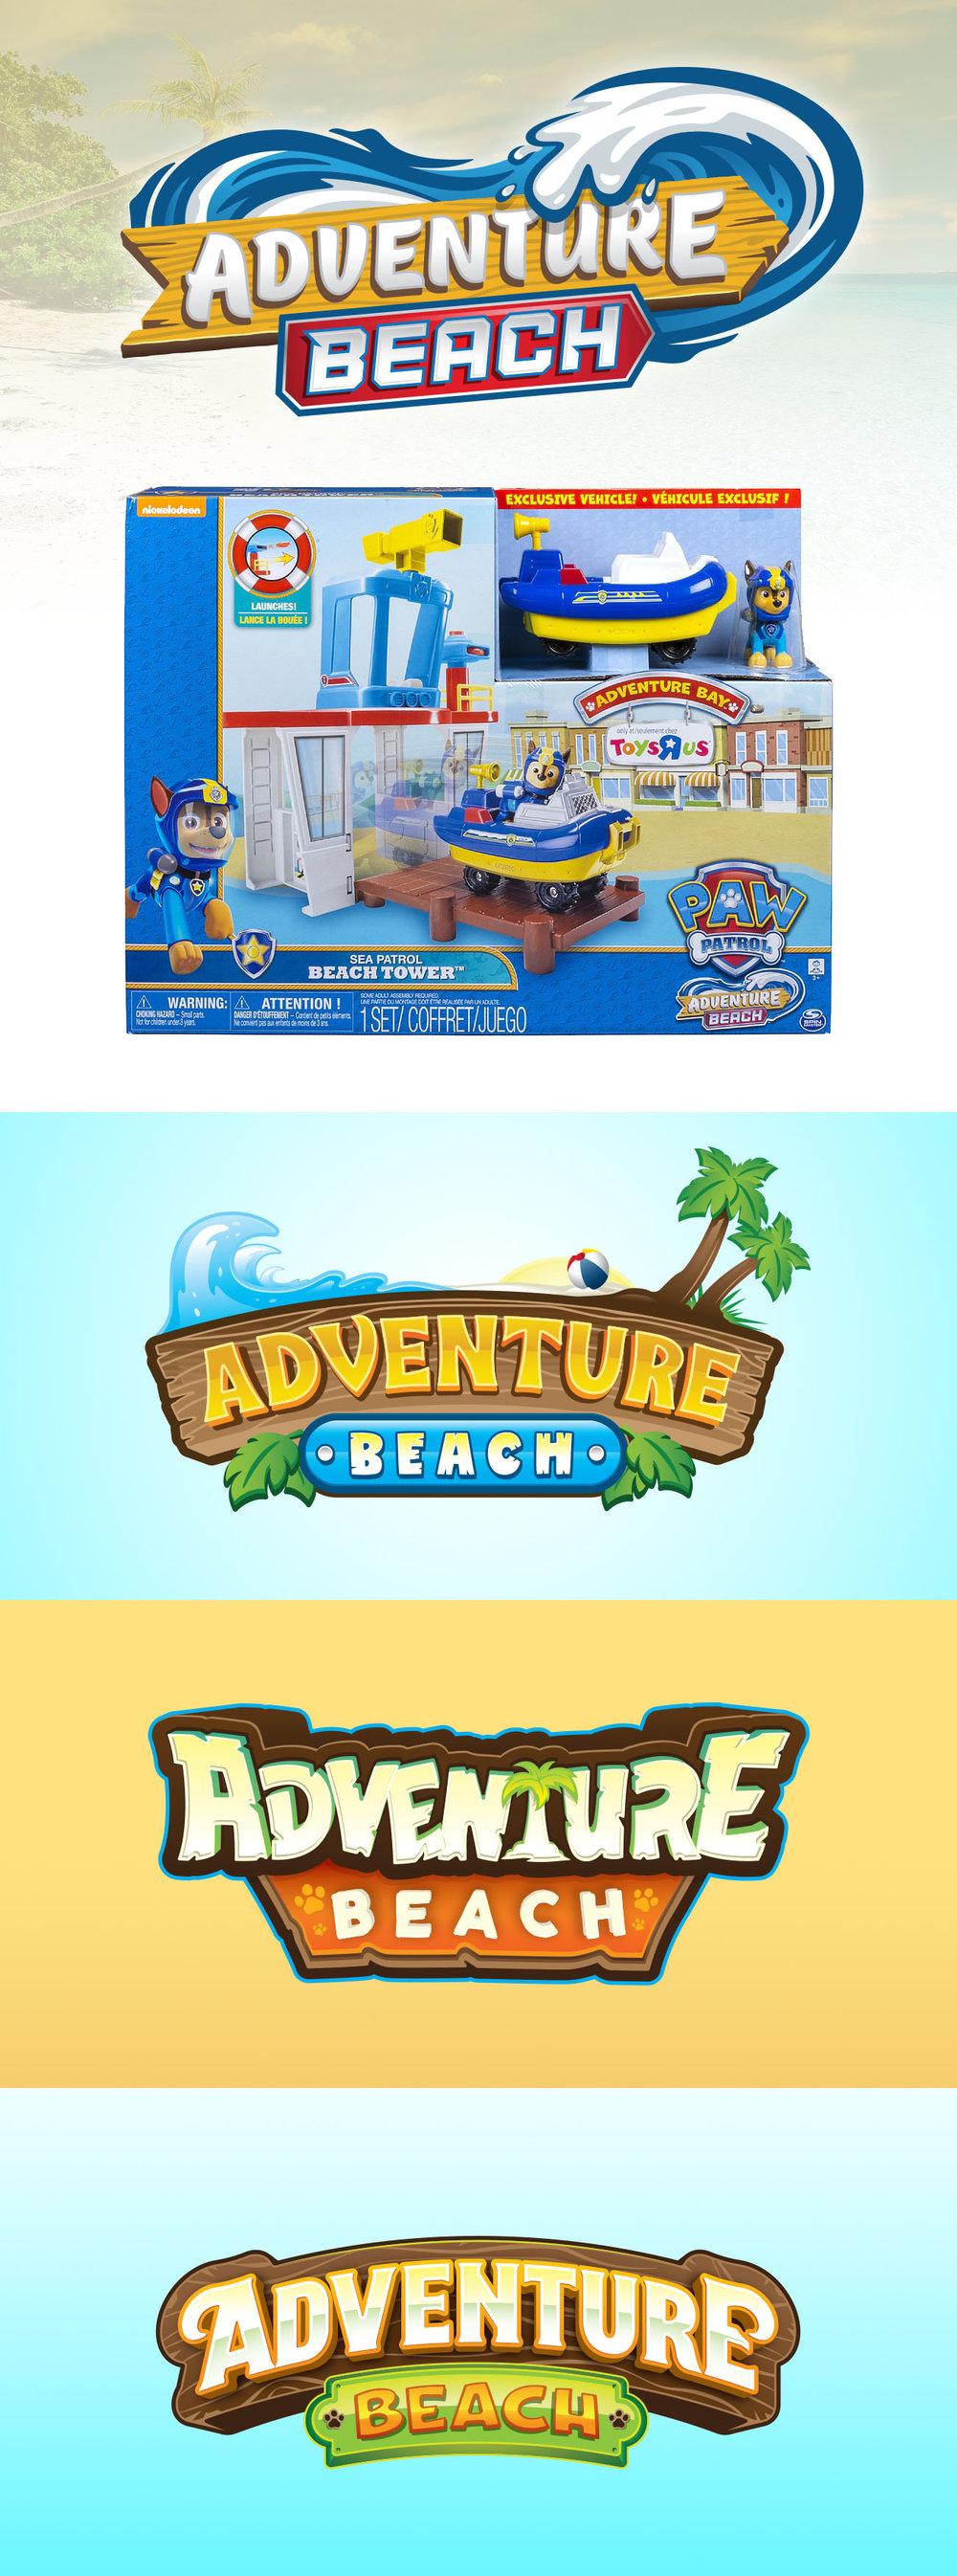 Adventure_Beach_02.jpg